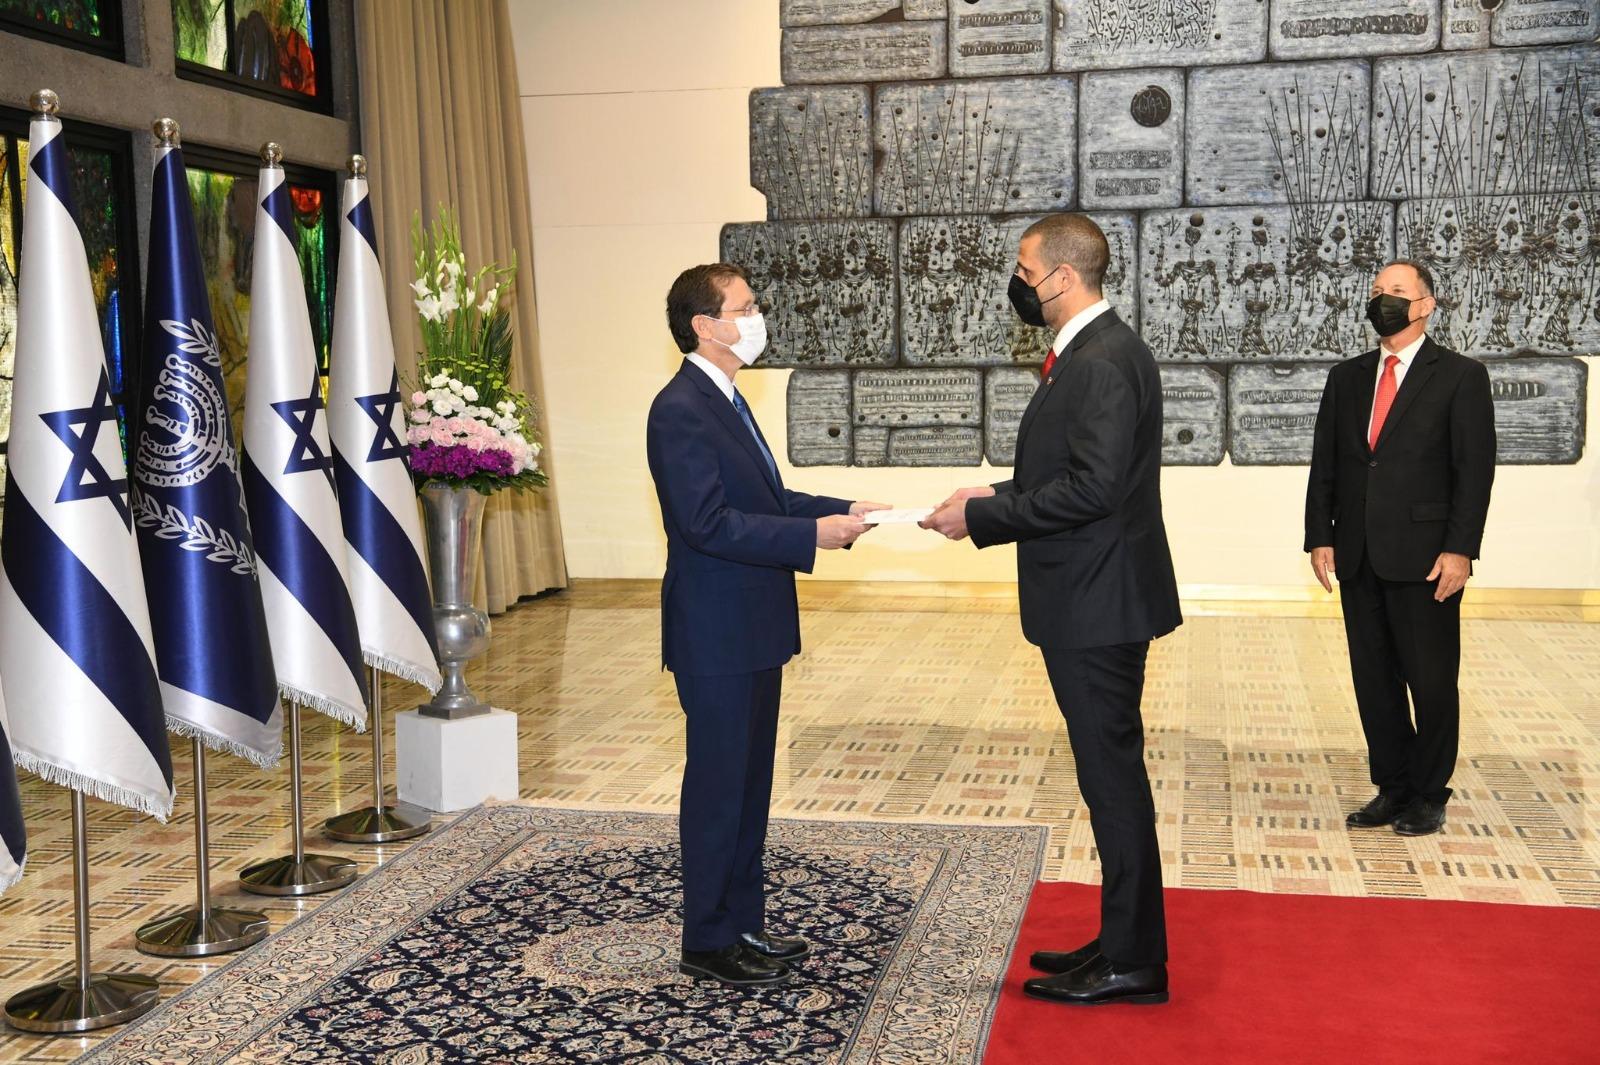 Bahrains 1st ambassador to Israel presents credentials